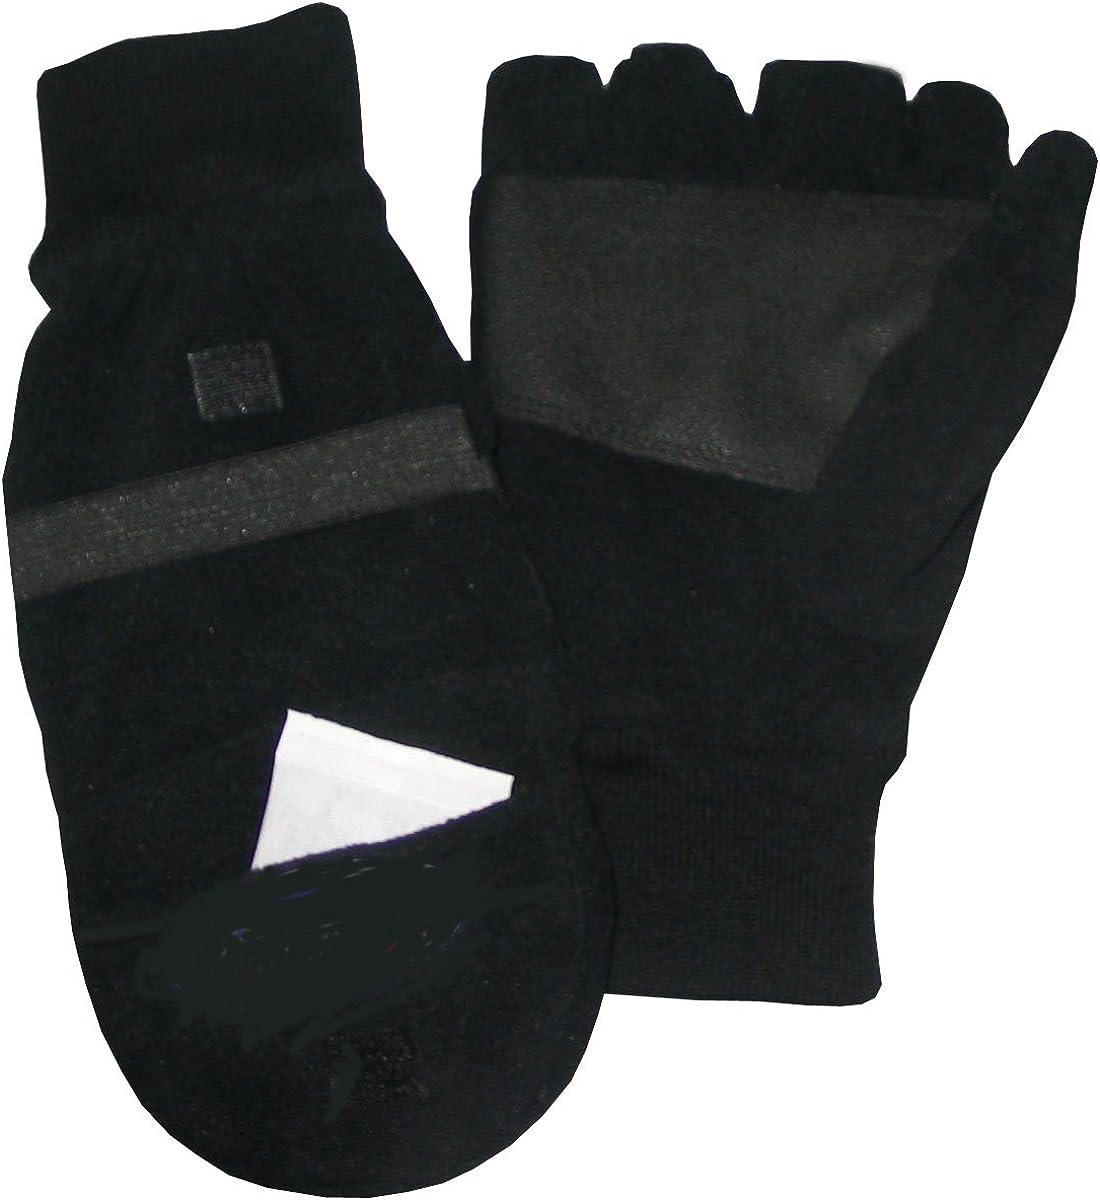 Black Fleece Mitten/Open Finger Gloves With Two Pair Heat Paks - Mens Large